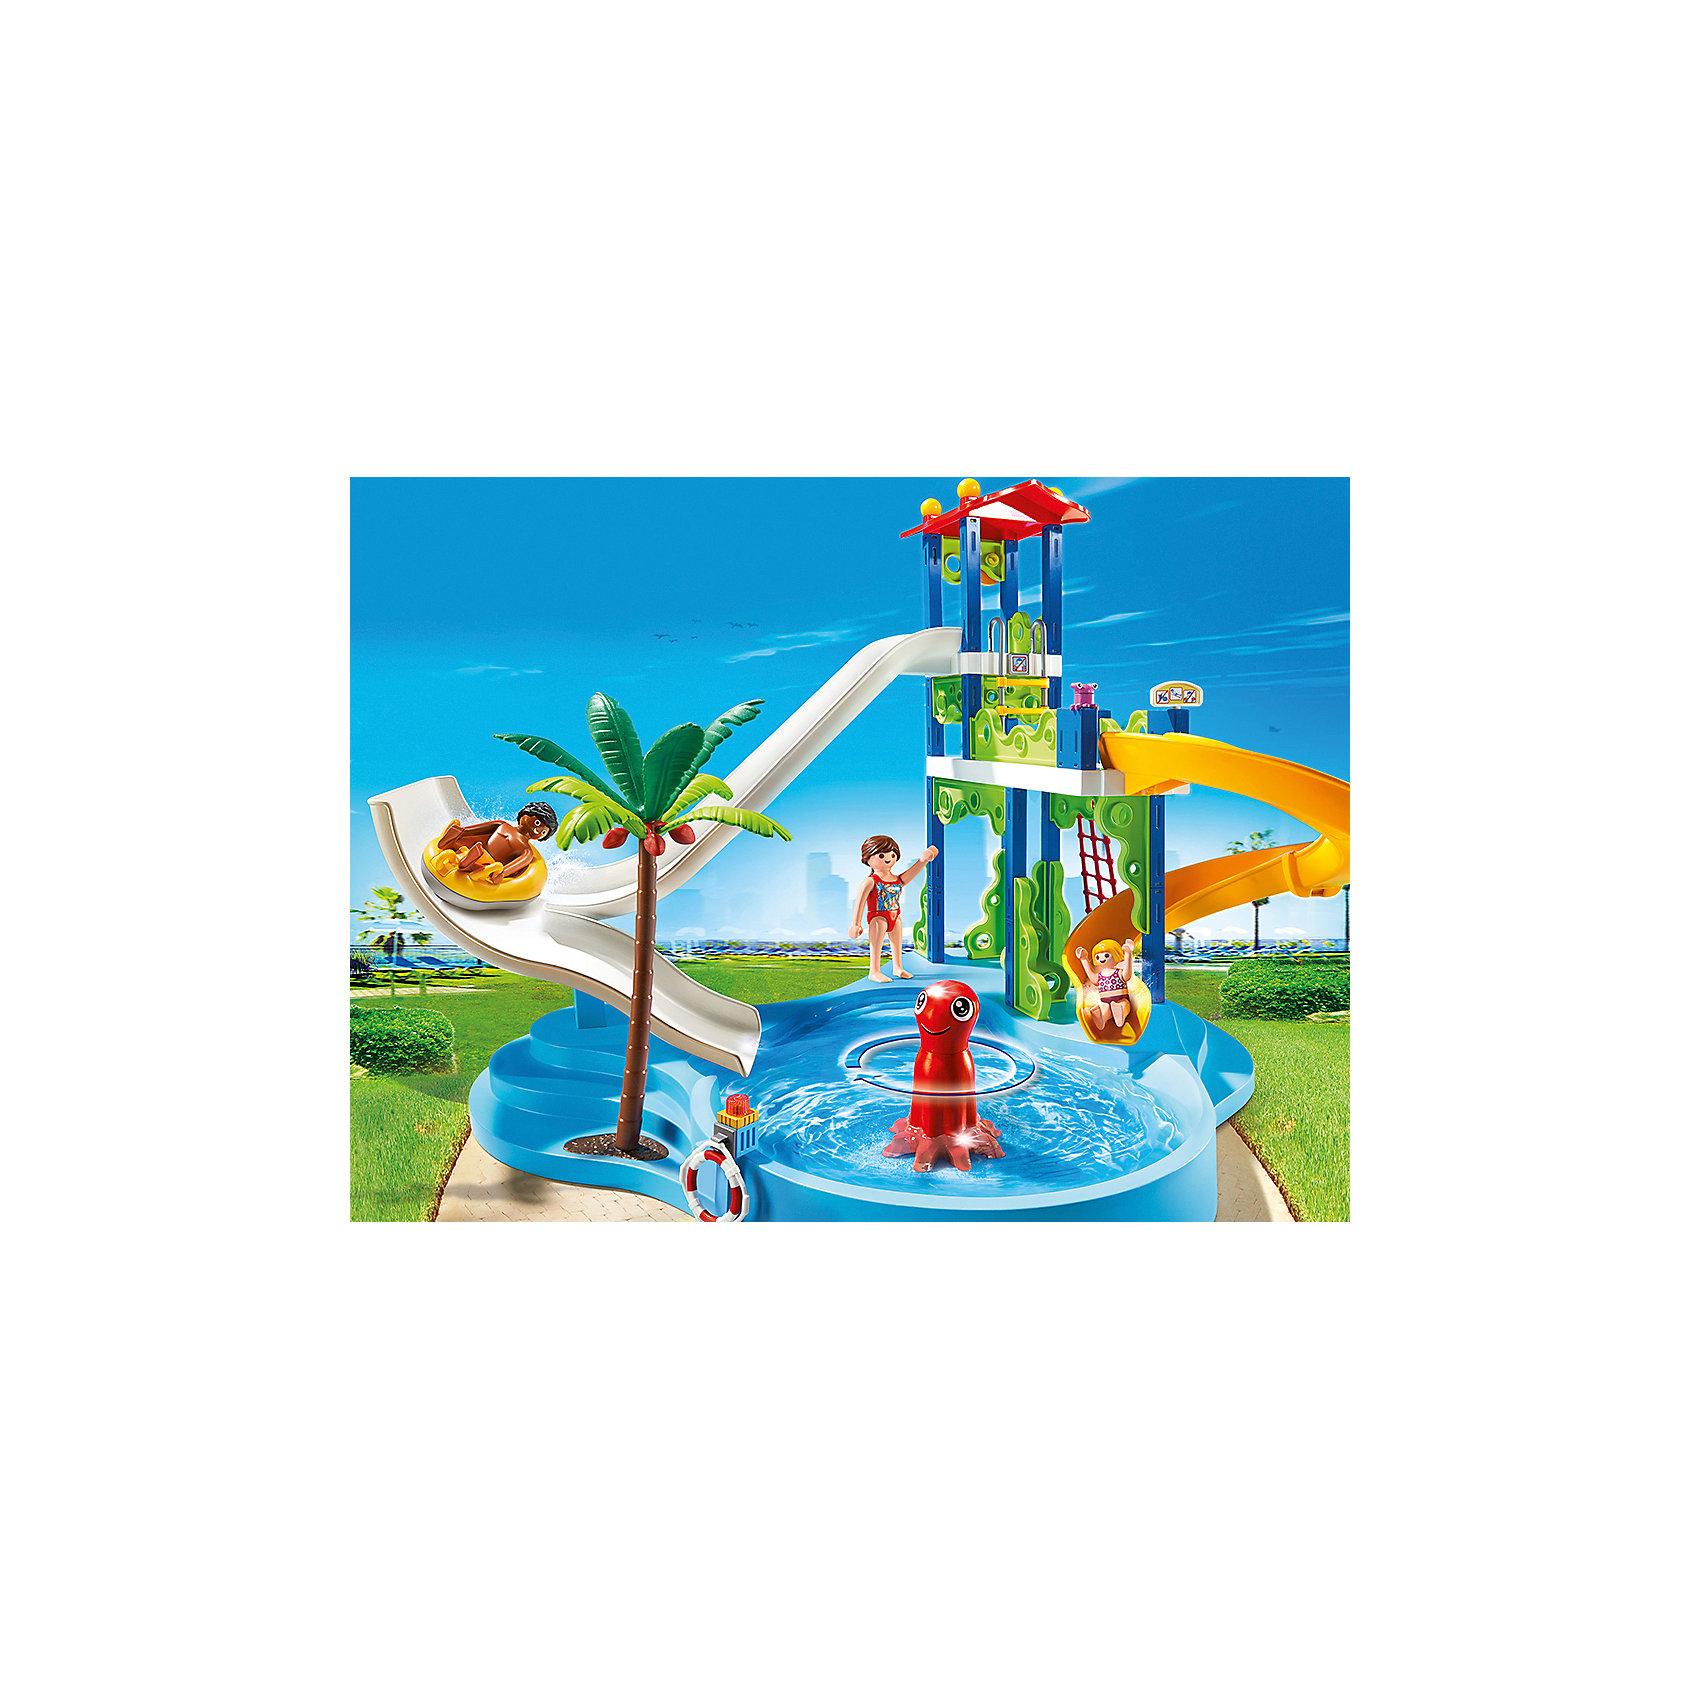 PLAYMOBIL® Аквапарк: Башня с горками, PLAYMOBIL